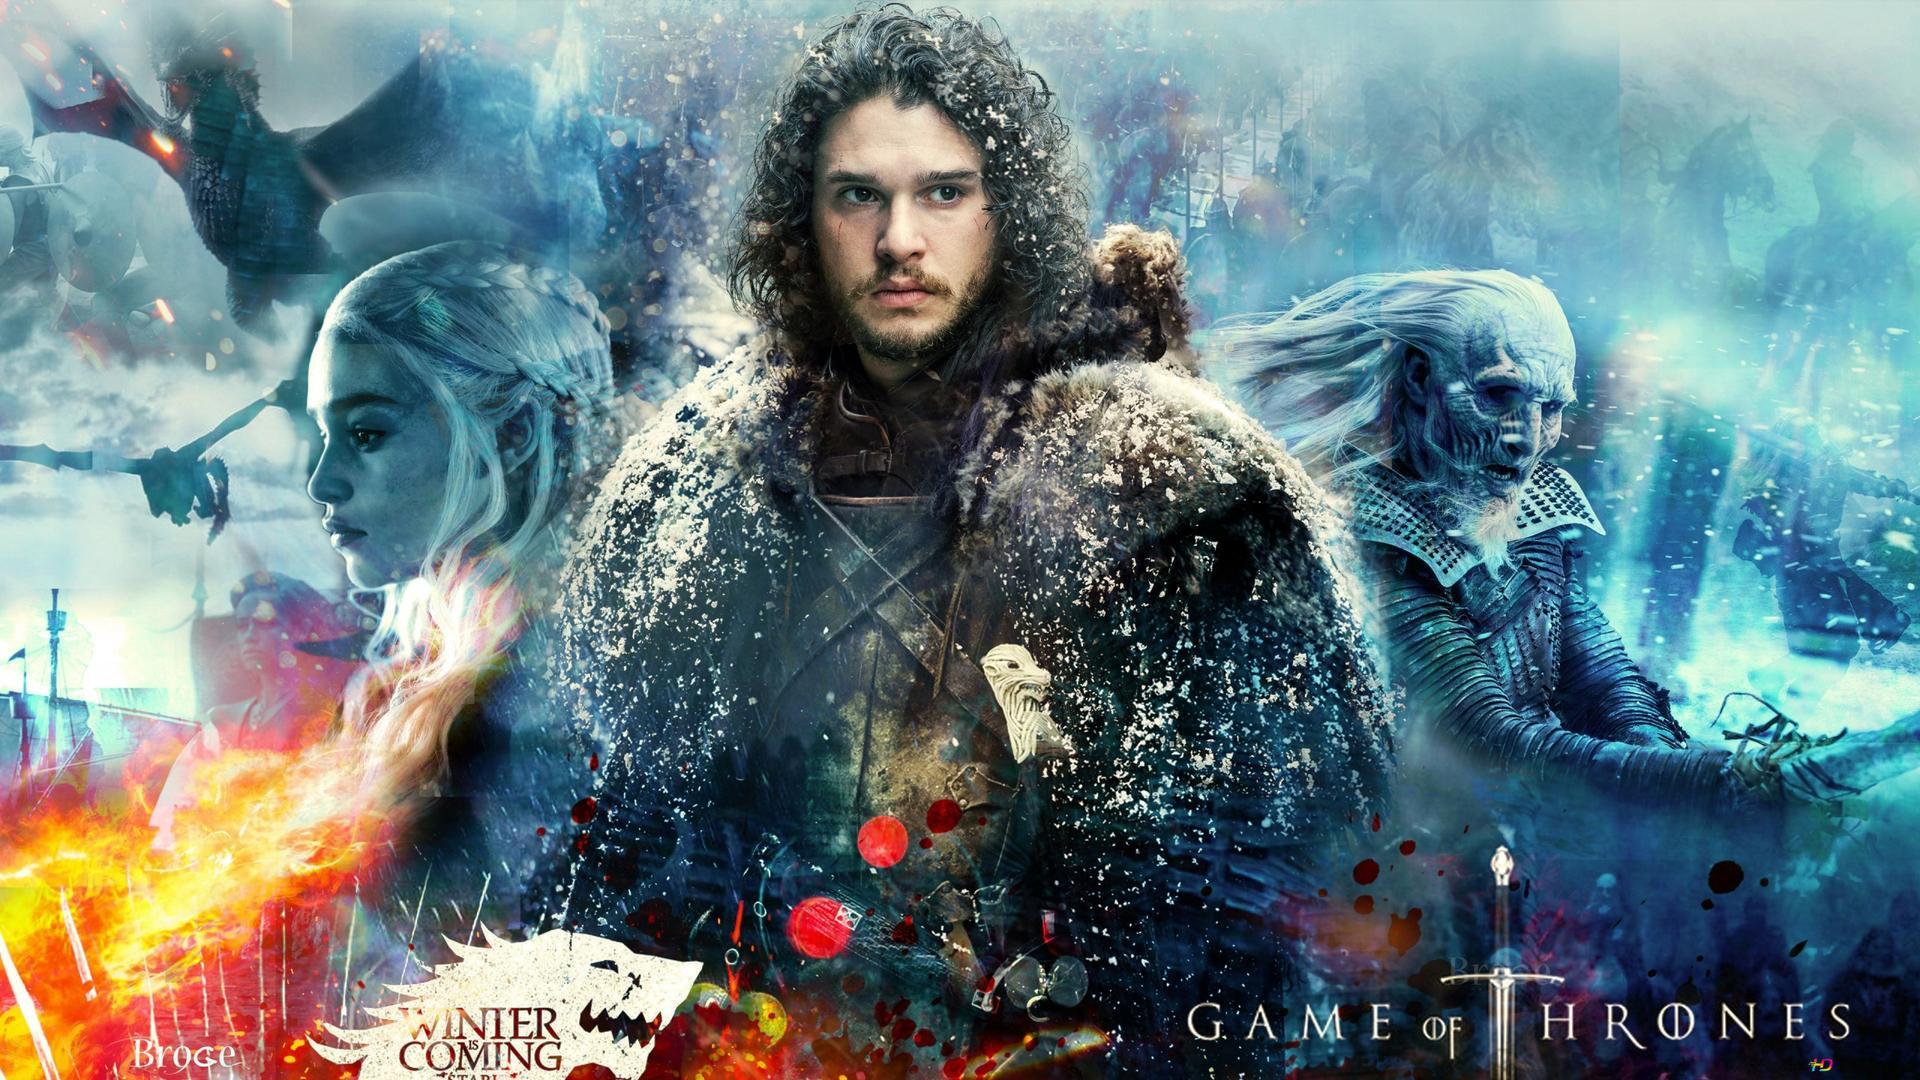 Game Of Thrones Serie Jon Snow Hd Hintergrundbilder